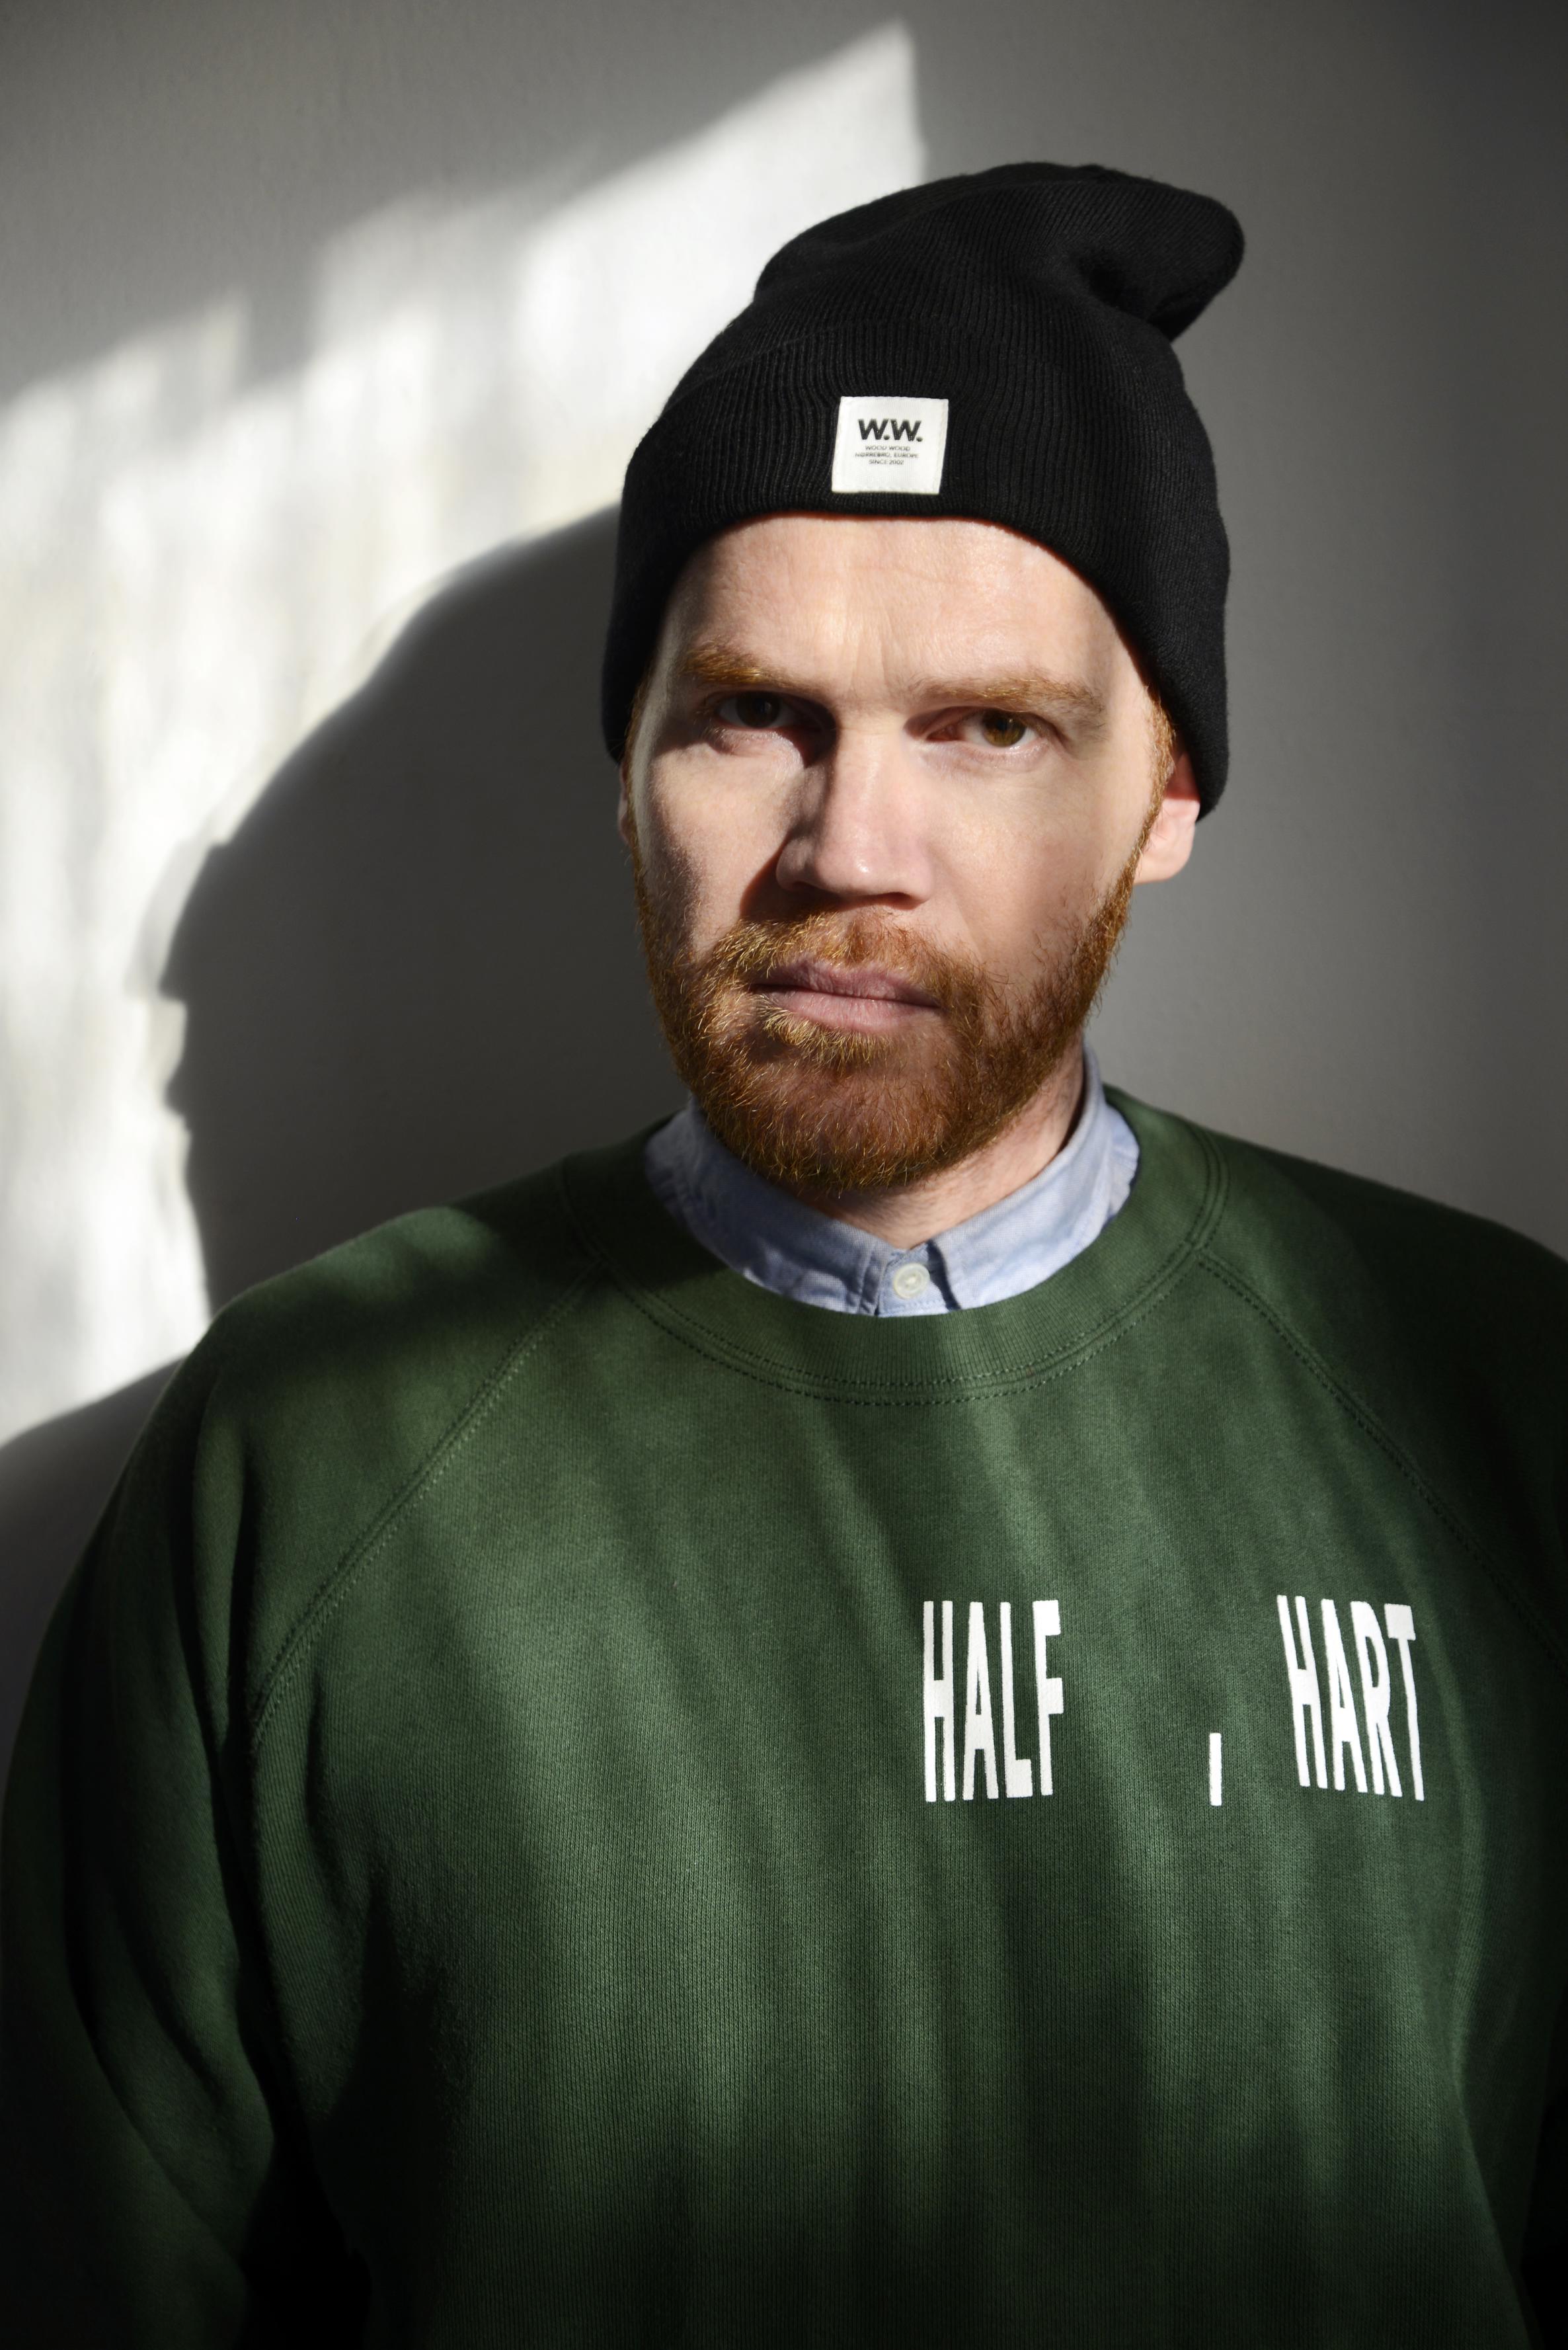 Half   ,   Hart apparel